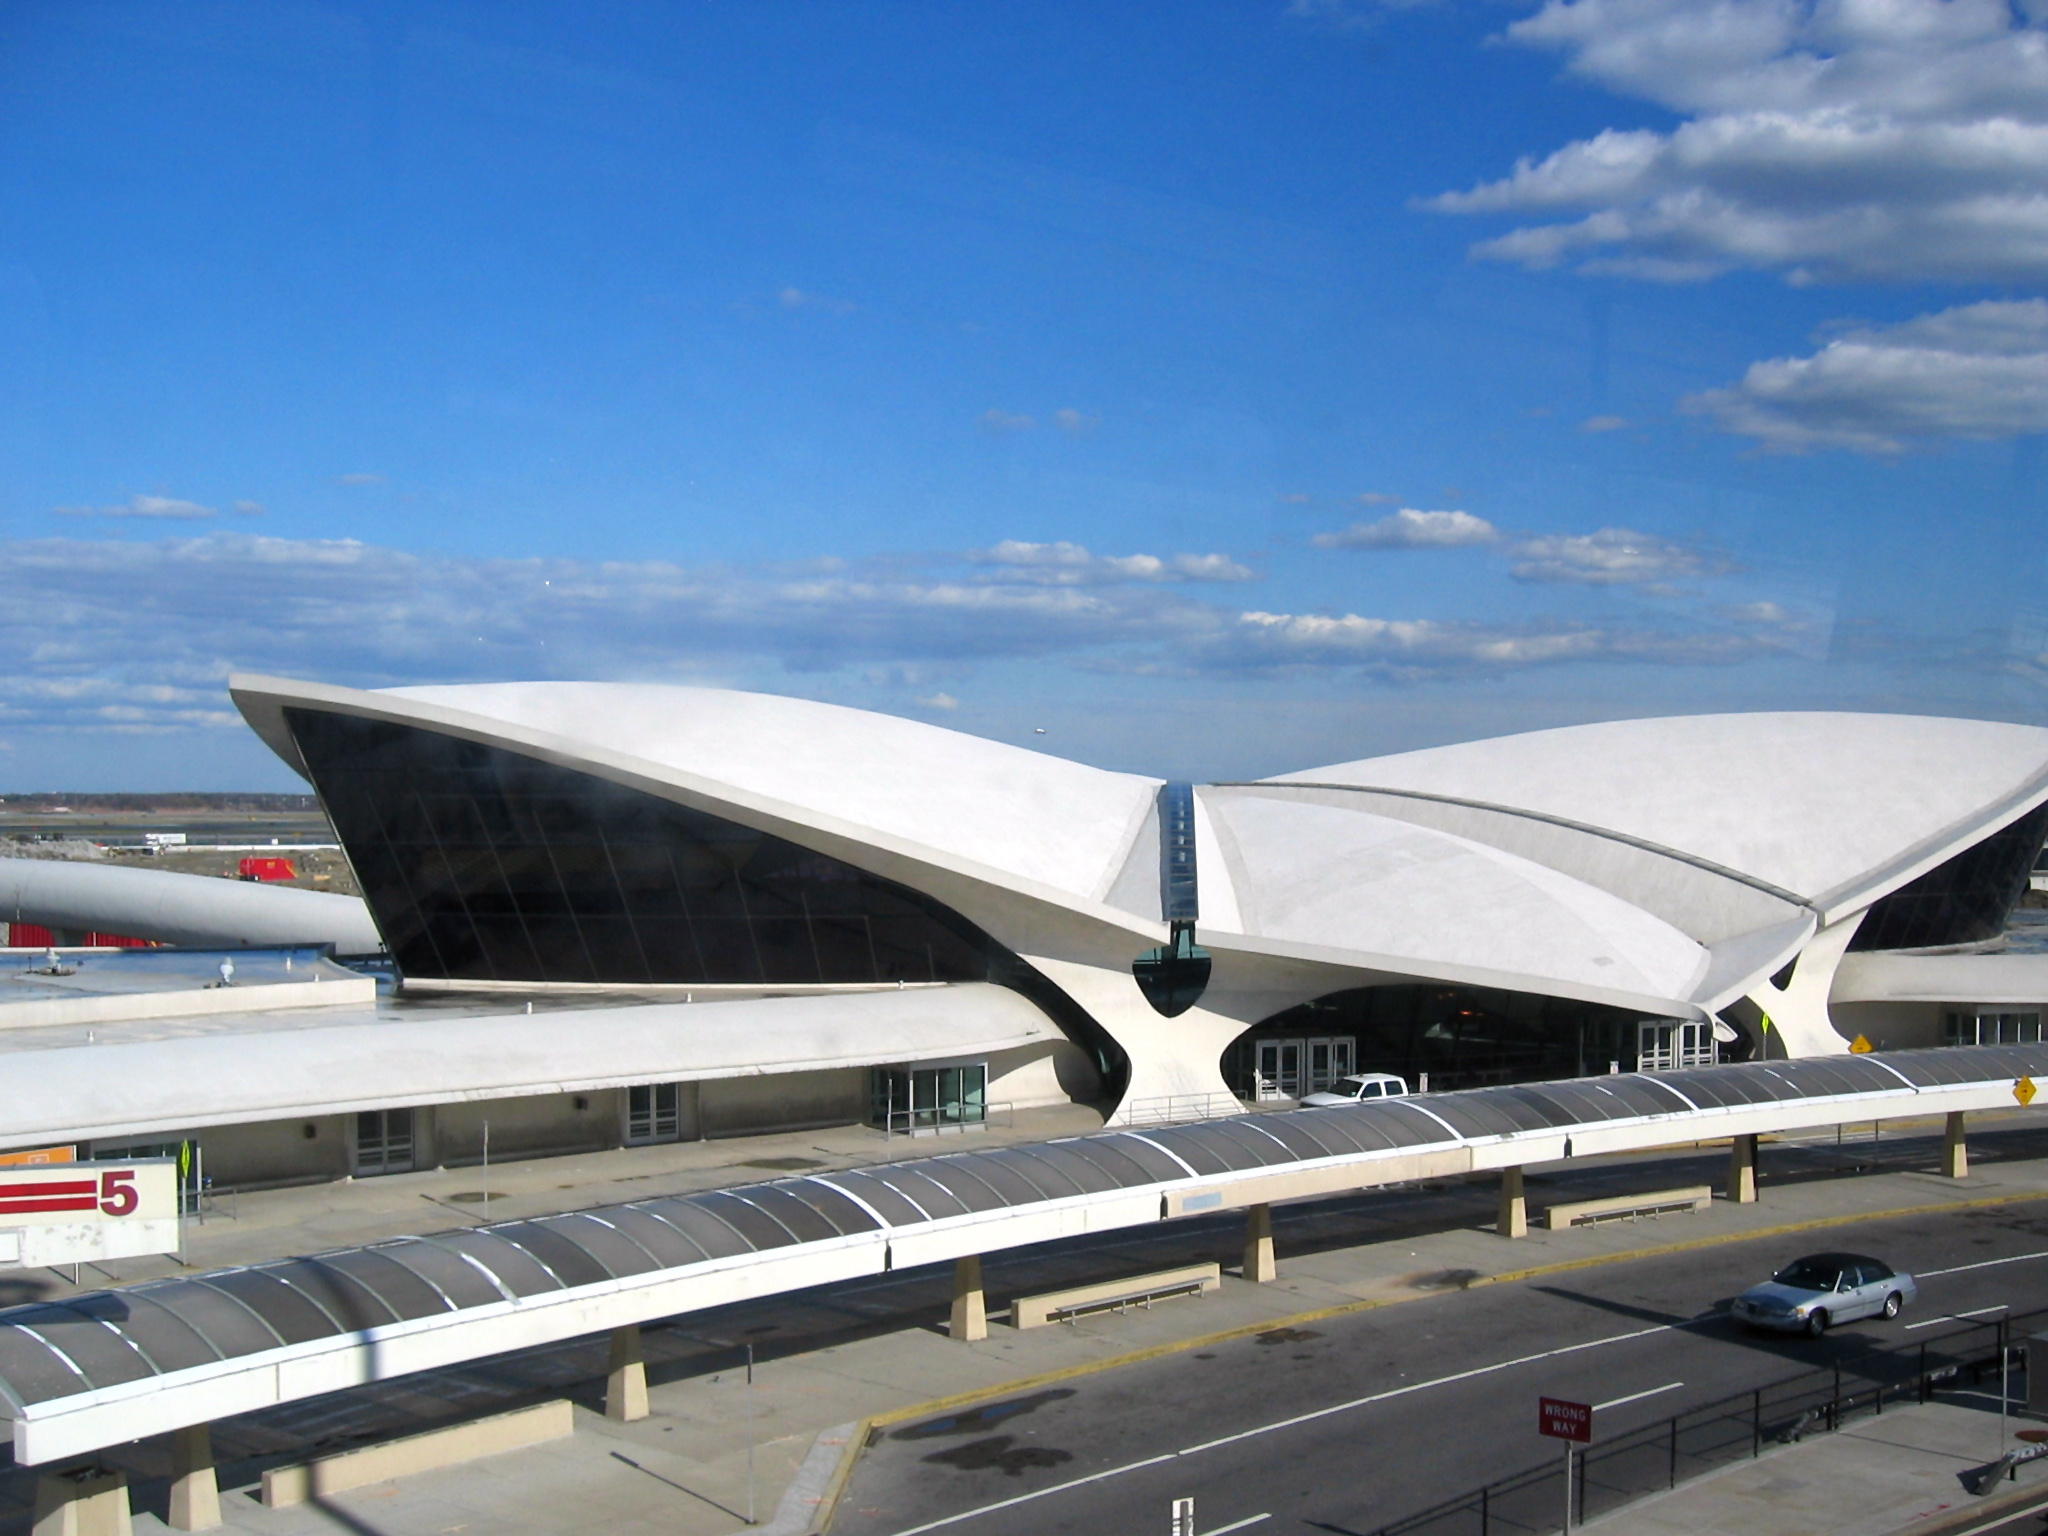 Aeroporto New York John F Kennedy : シーザー・ペリ wikipedia